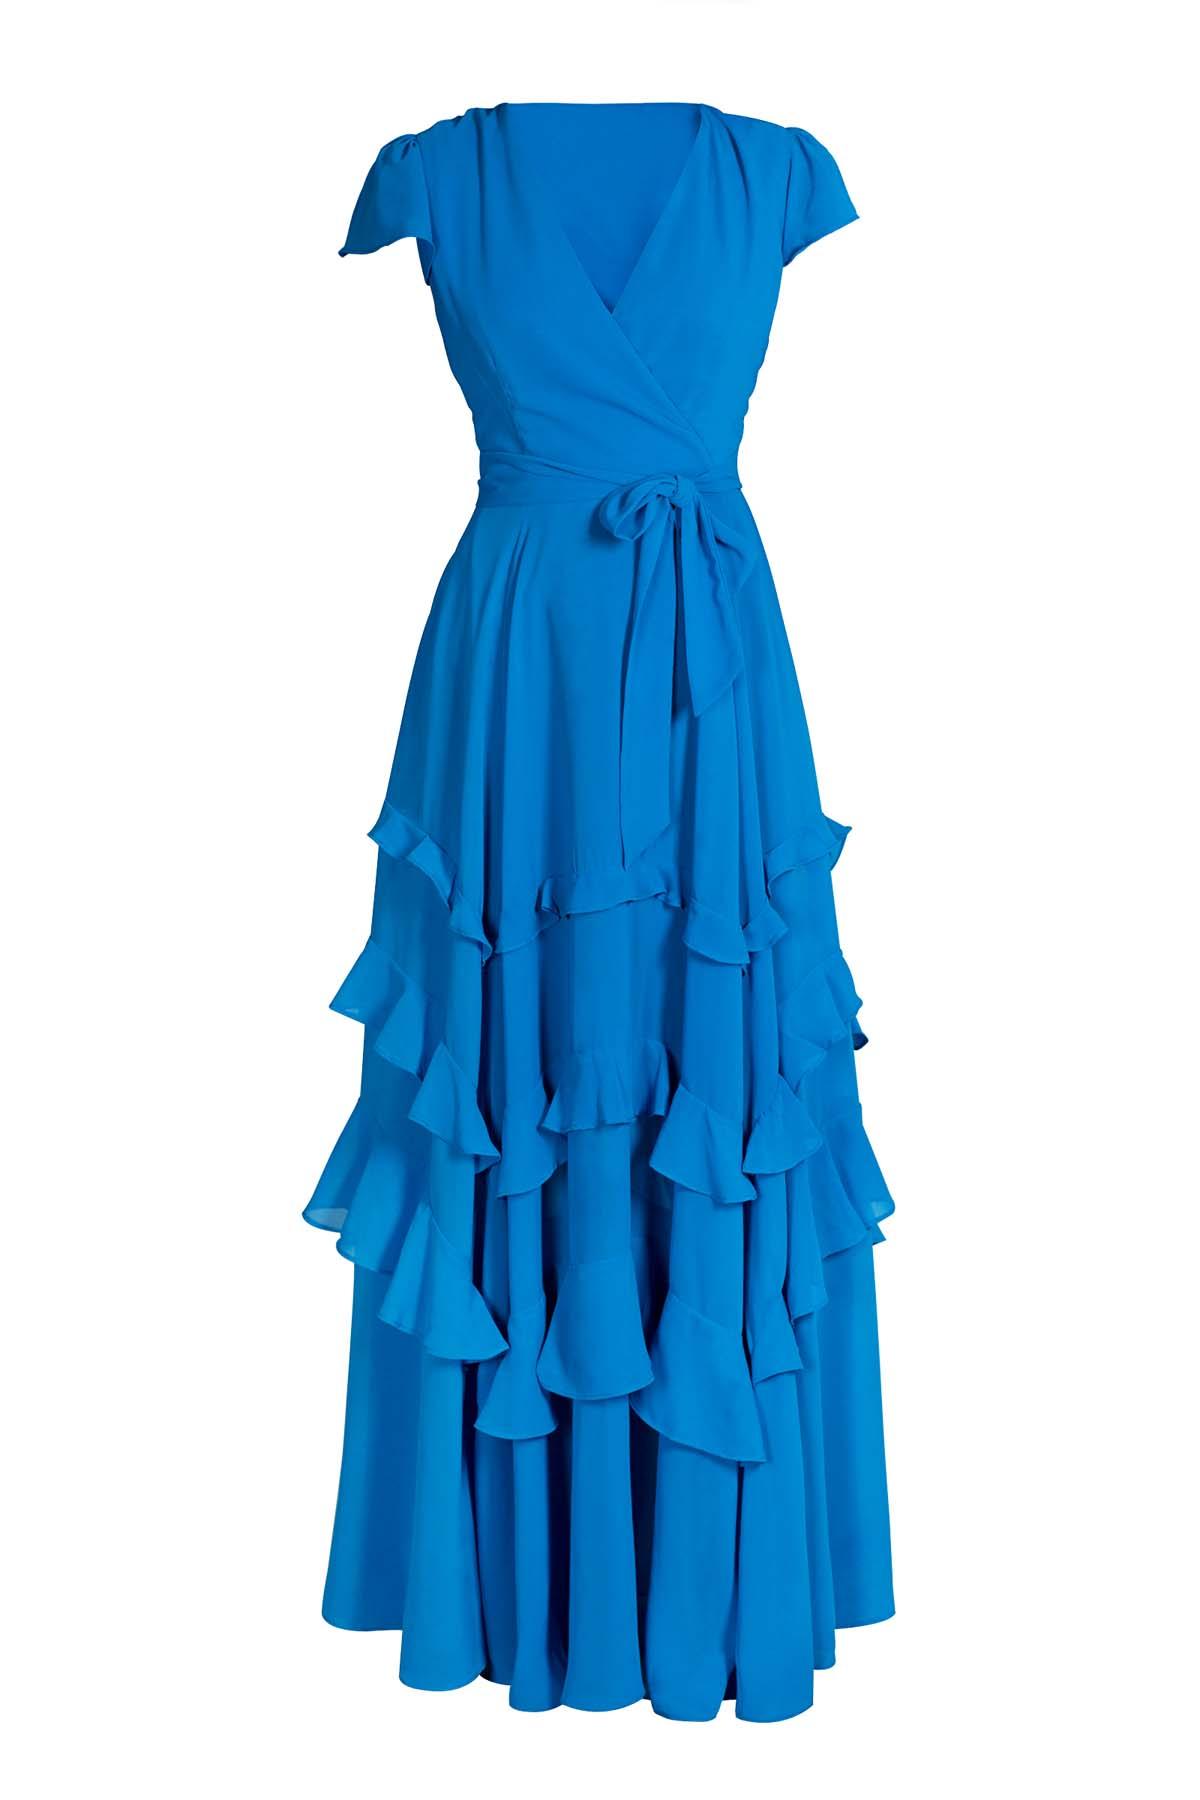 Teria Yabar - Vestido de gasa azul